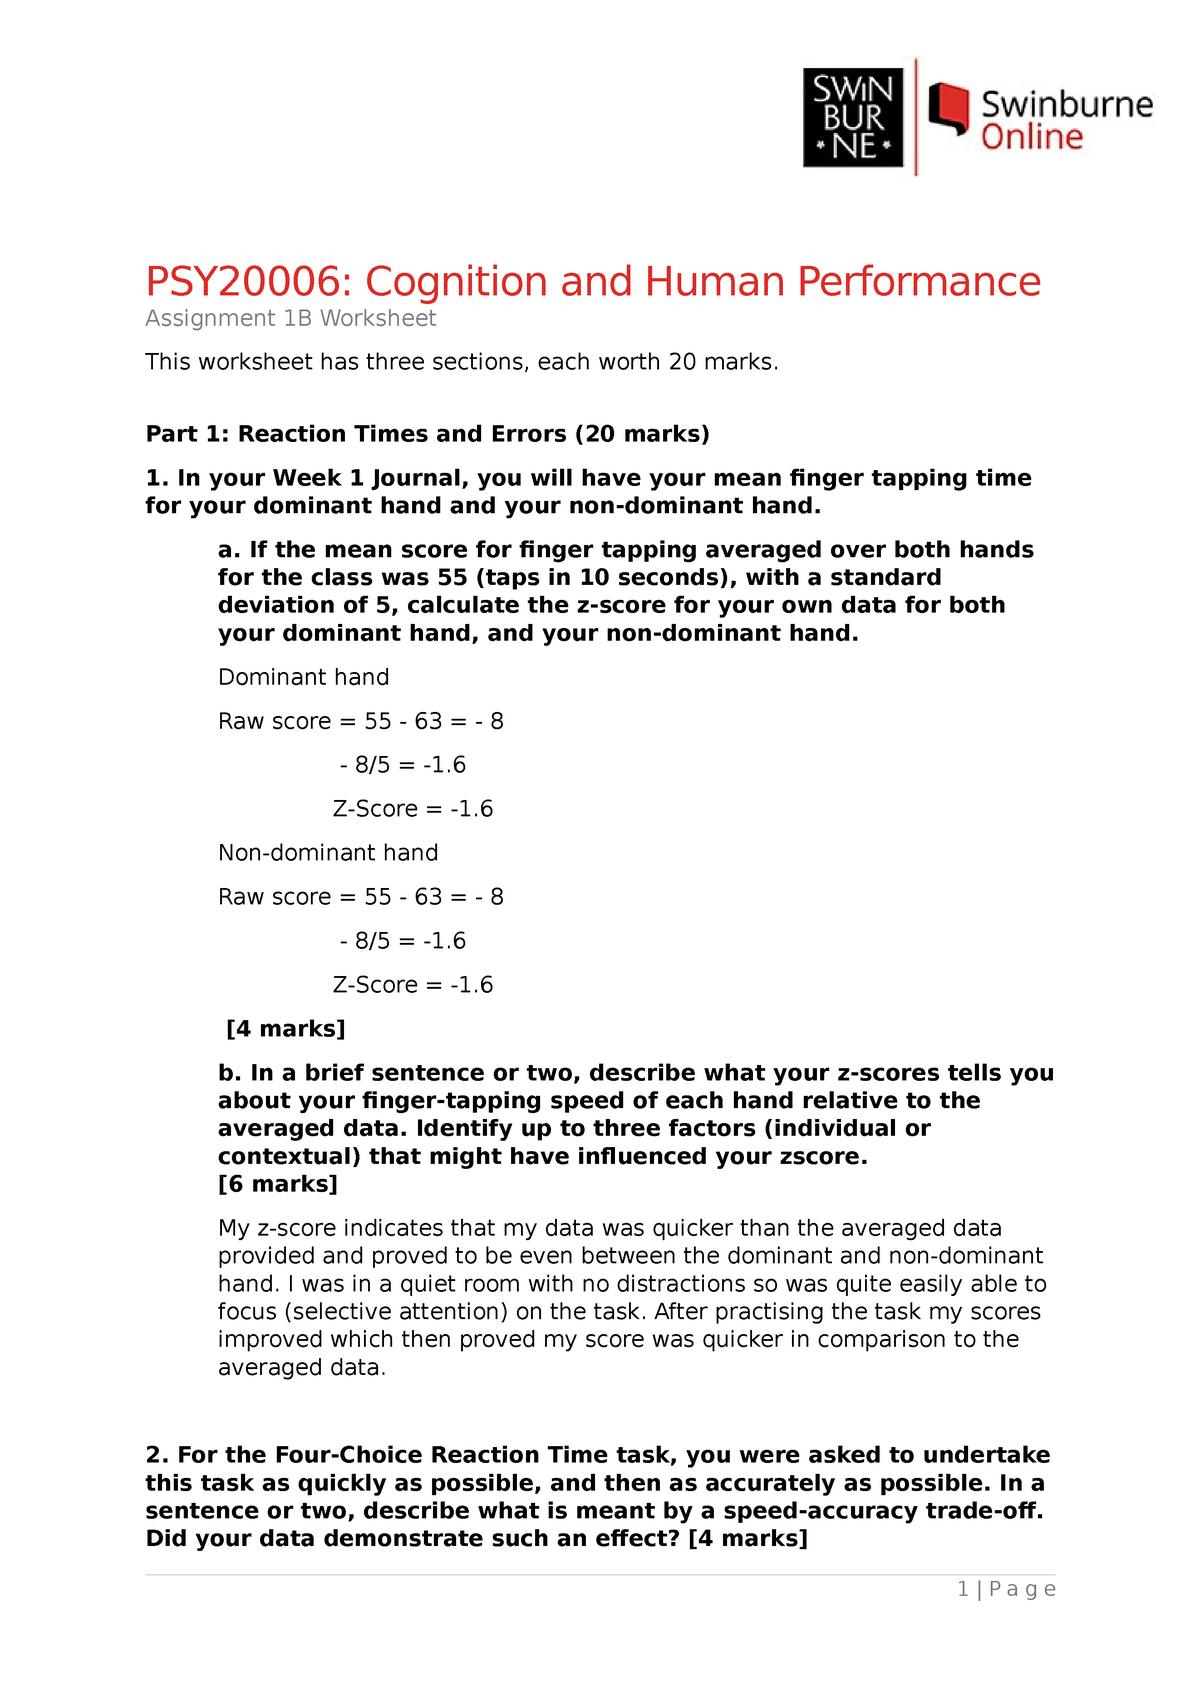 Assignment 24B Worksheet - psy24 - congnition - Swinburne - StuDocu For Z Score Practice Worksheet